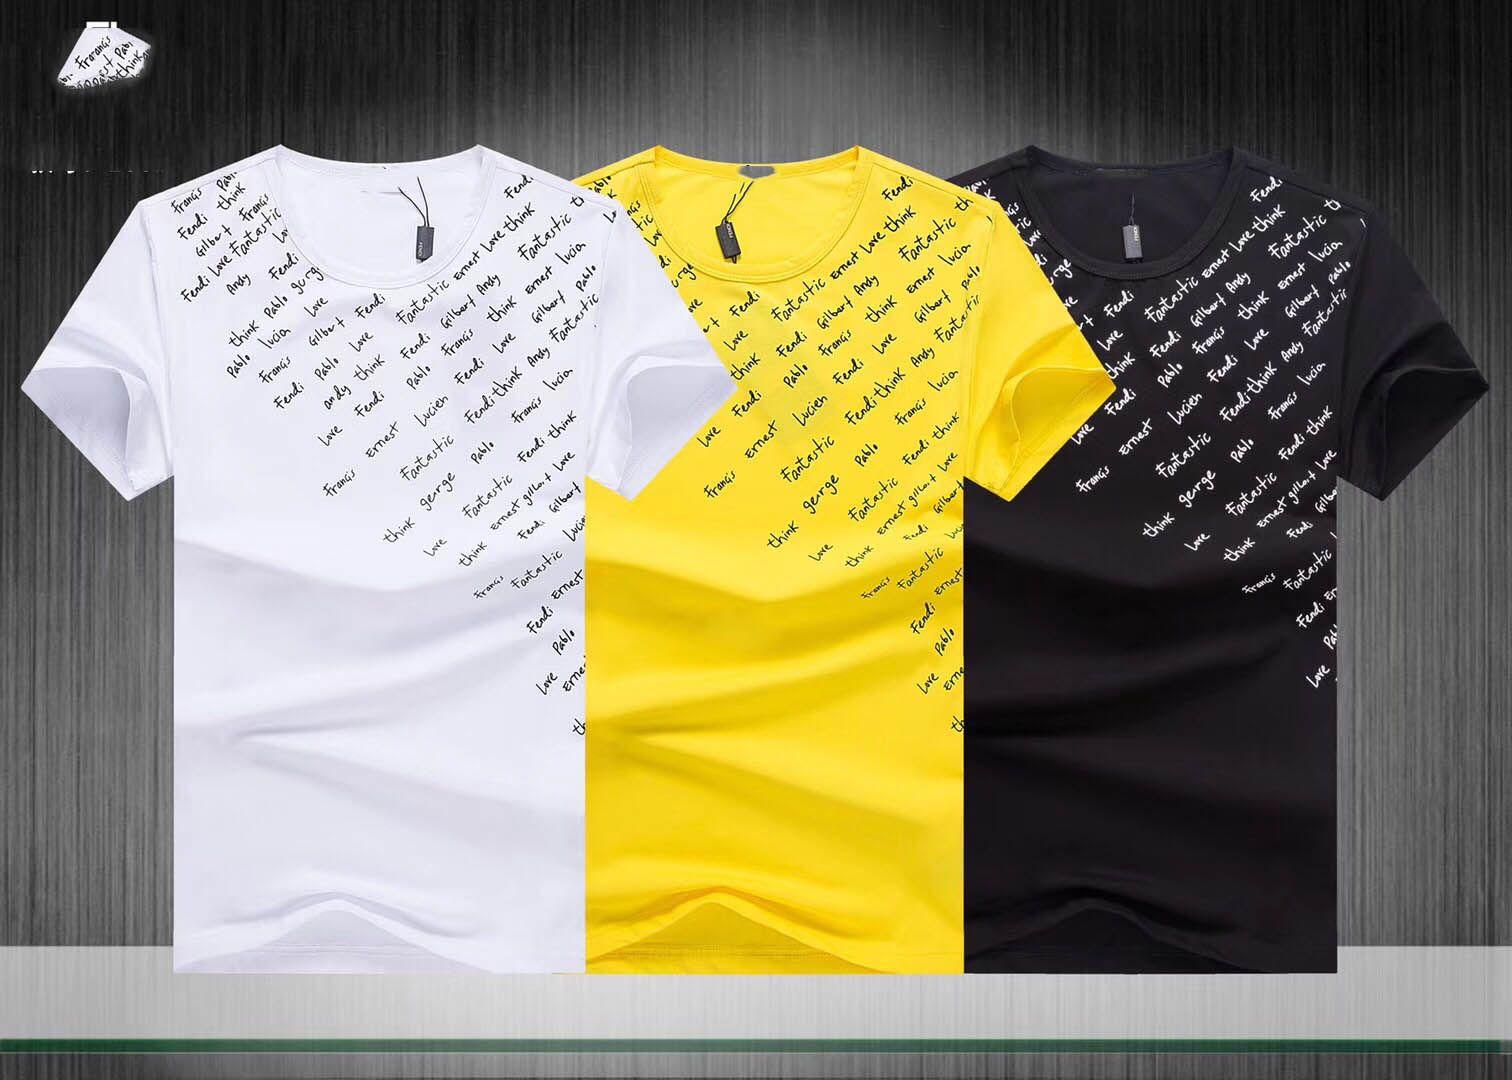 754435cfc 2019 High Quality Men T Shirts 100% Cotton Mens T Shirt Fashion Famous  Brand Tshirts Man Hot Sale M 3XL Awesome T Shirts For Guys Cool Tee Shirt  Designs ...